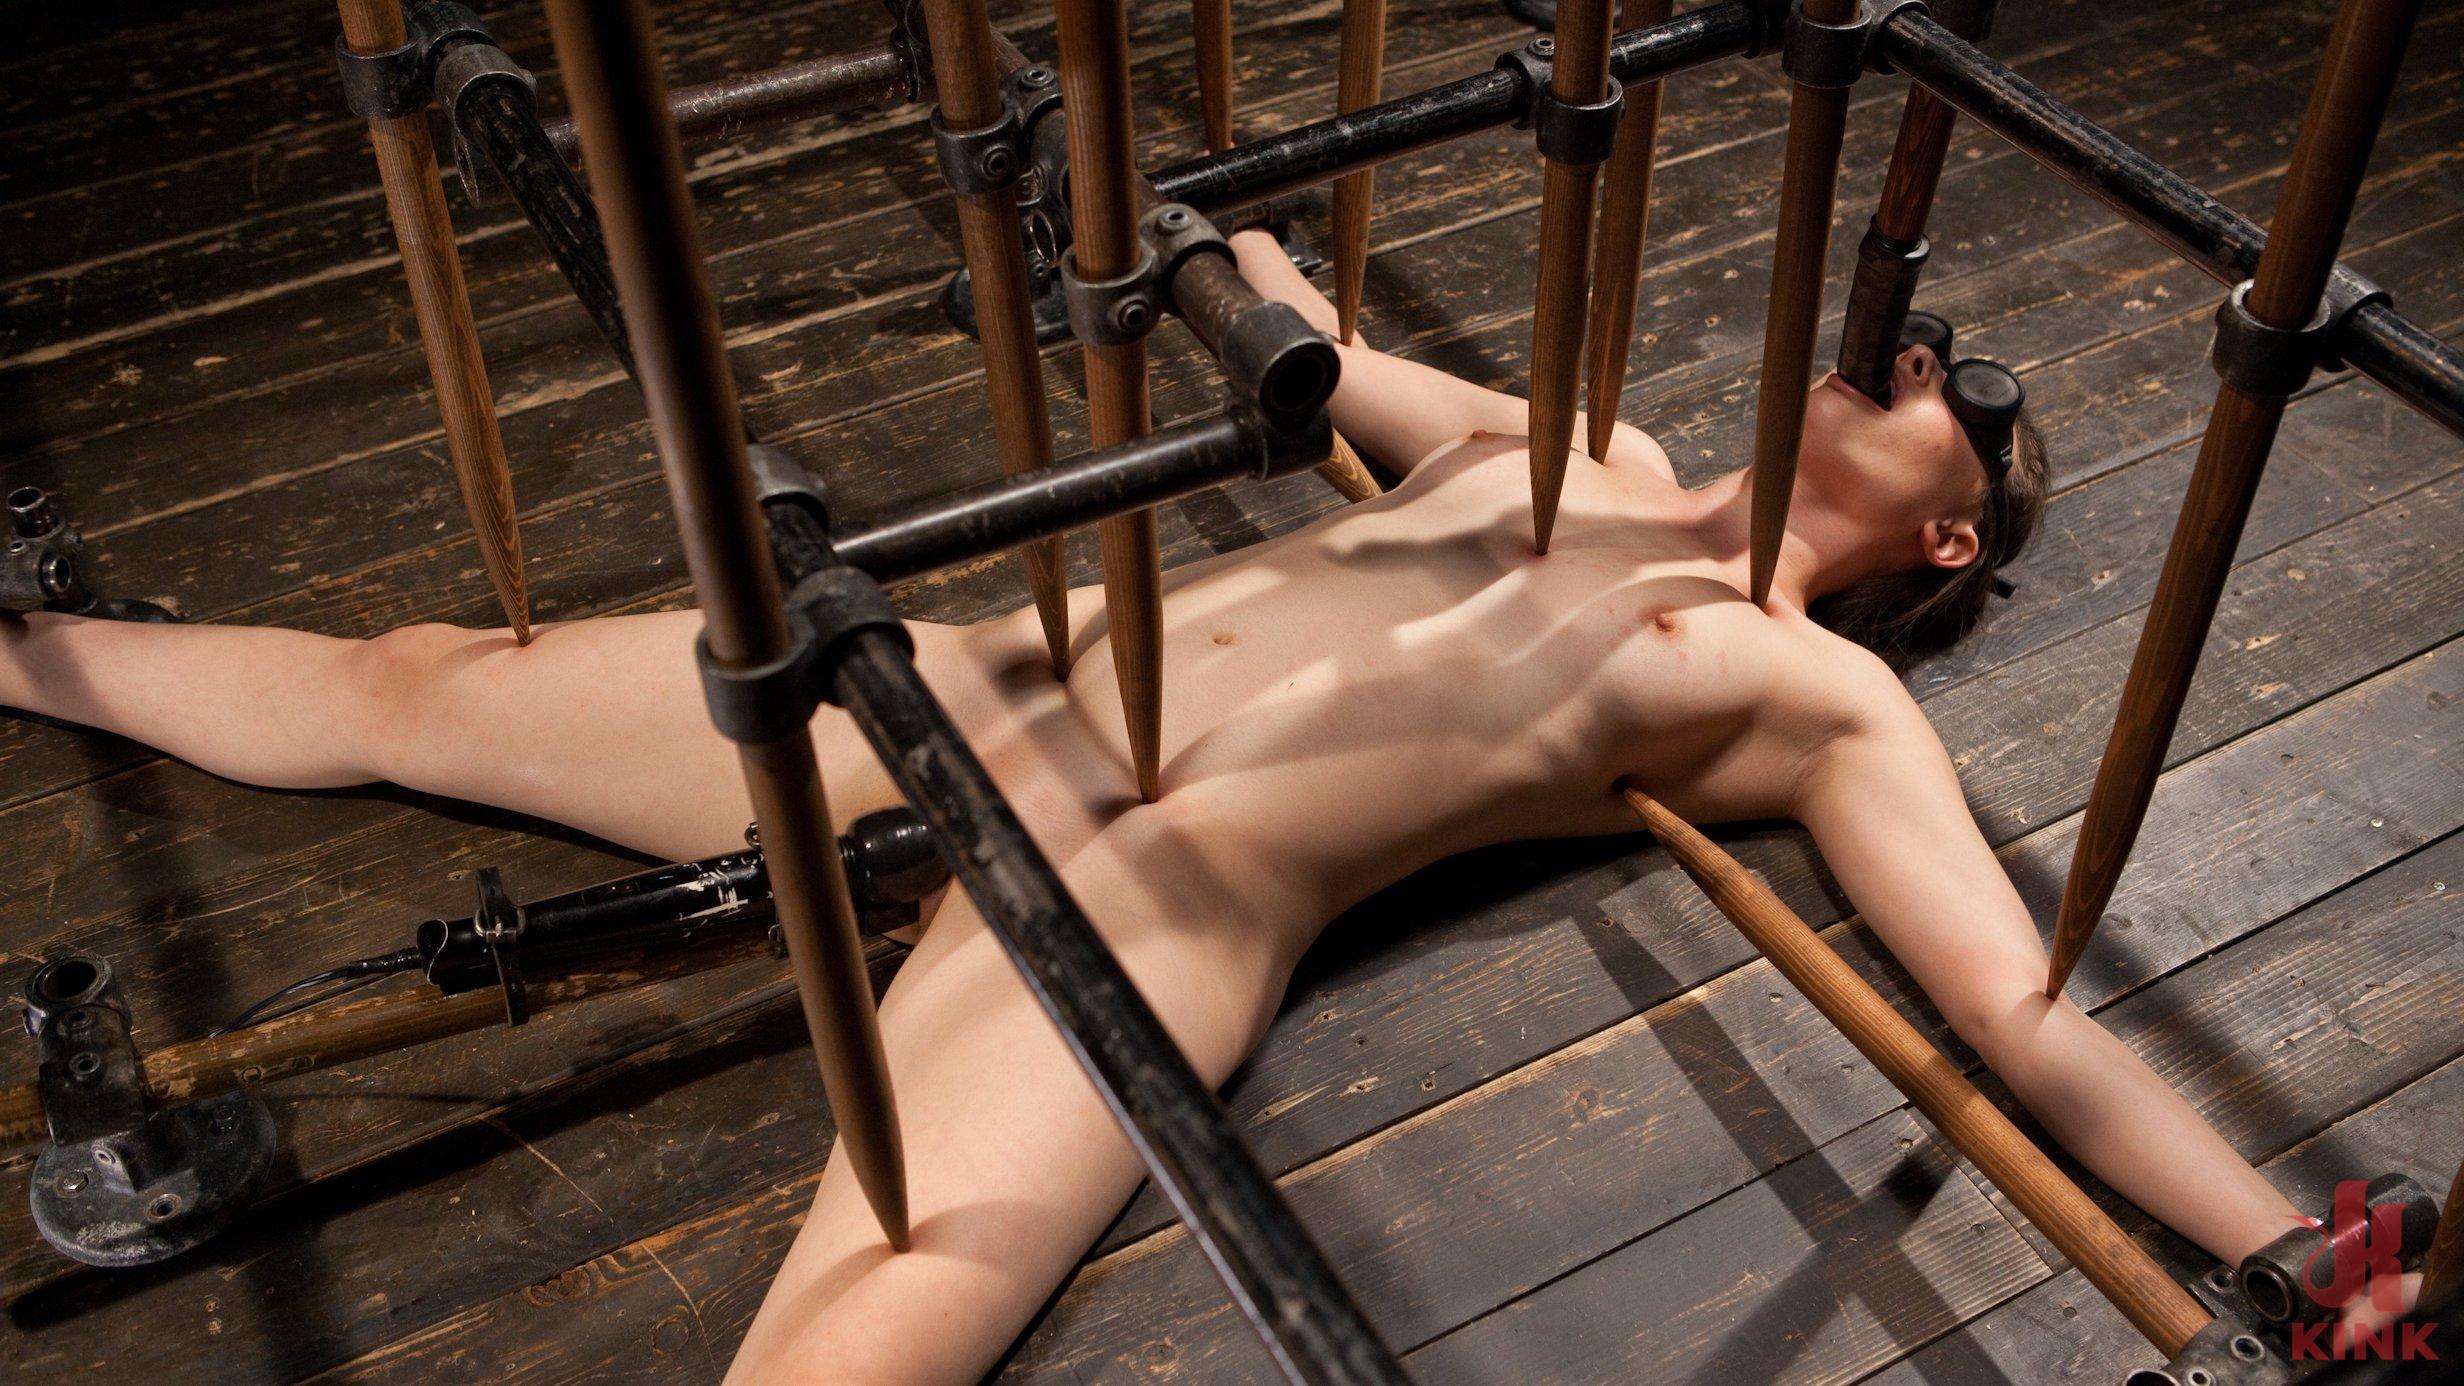 Woman In Bondage Video 11